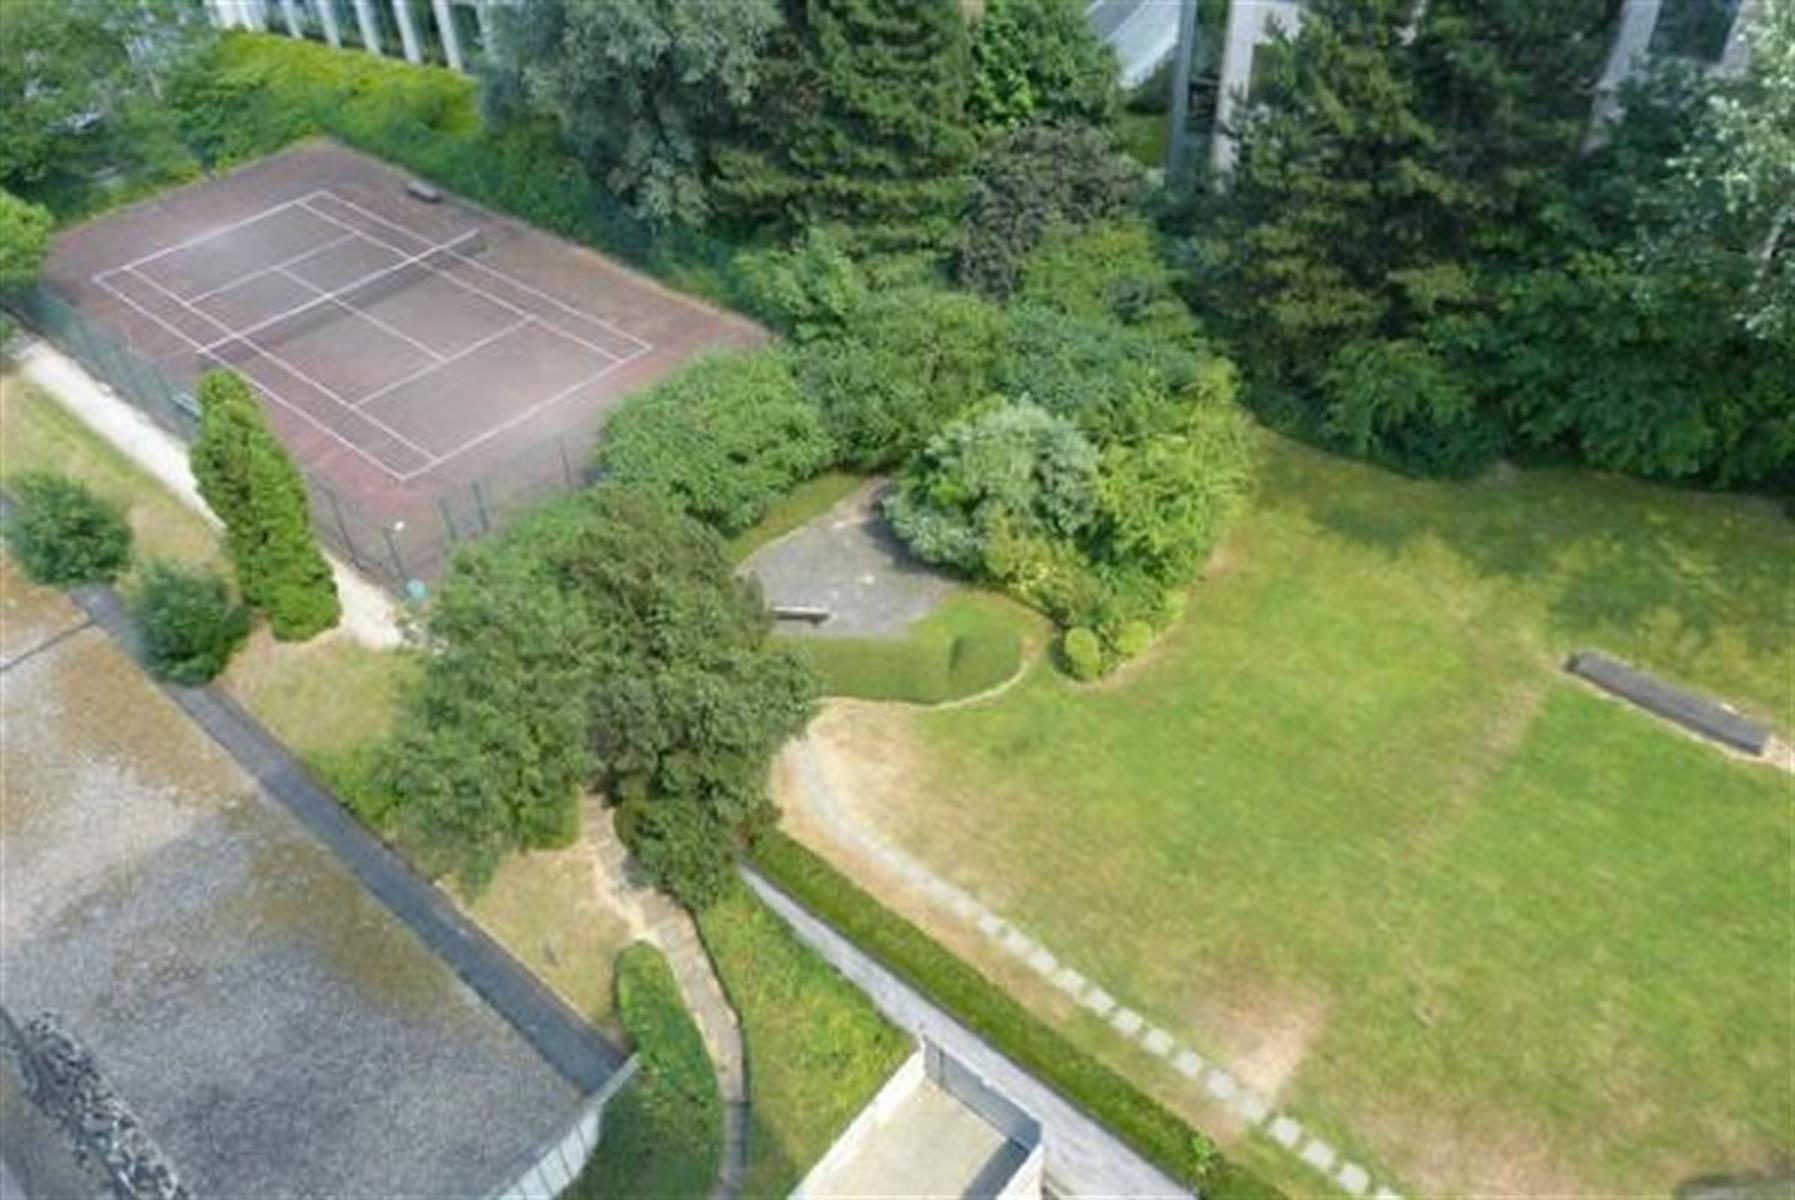 Appartement - Zaventem Sint-Stevens-Woluwe - #4218075-10